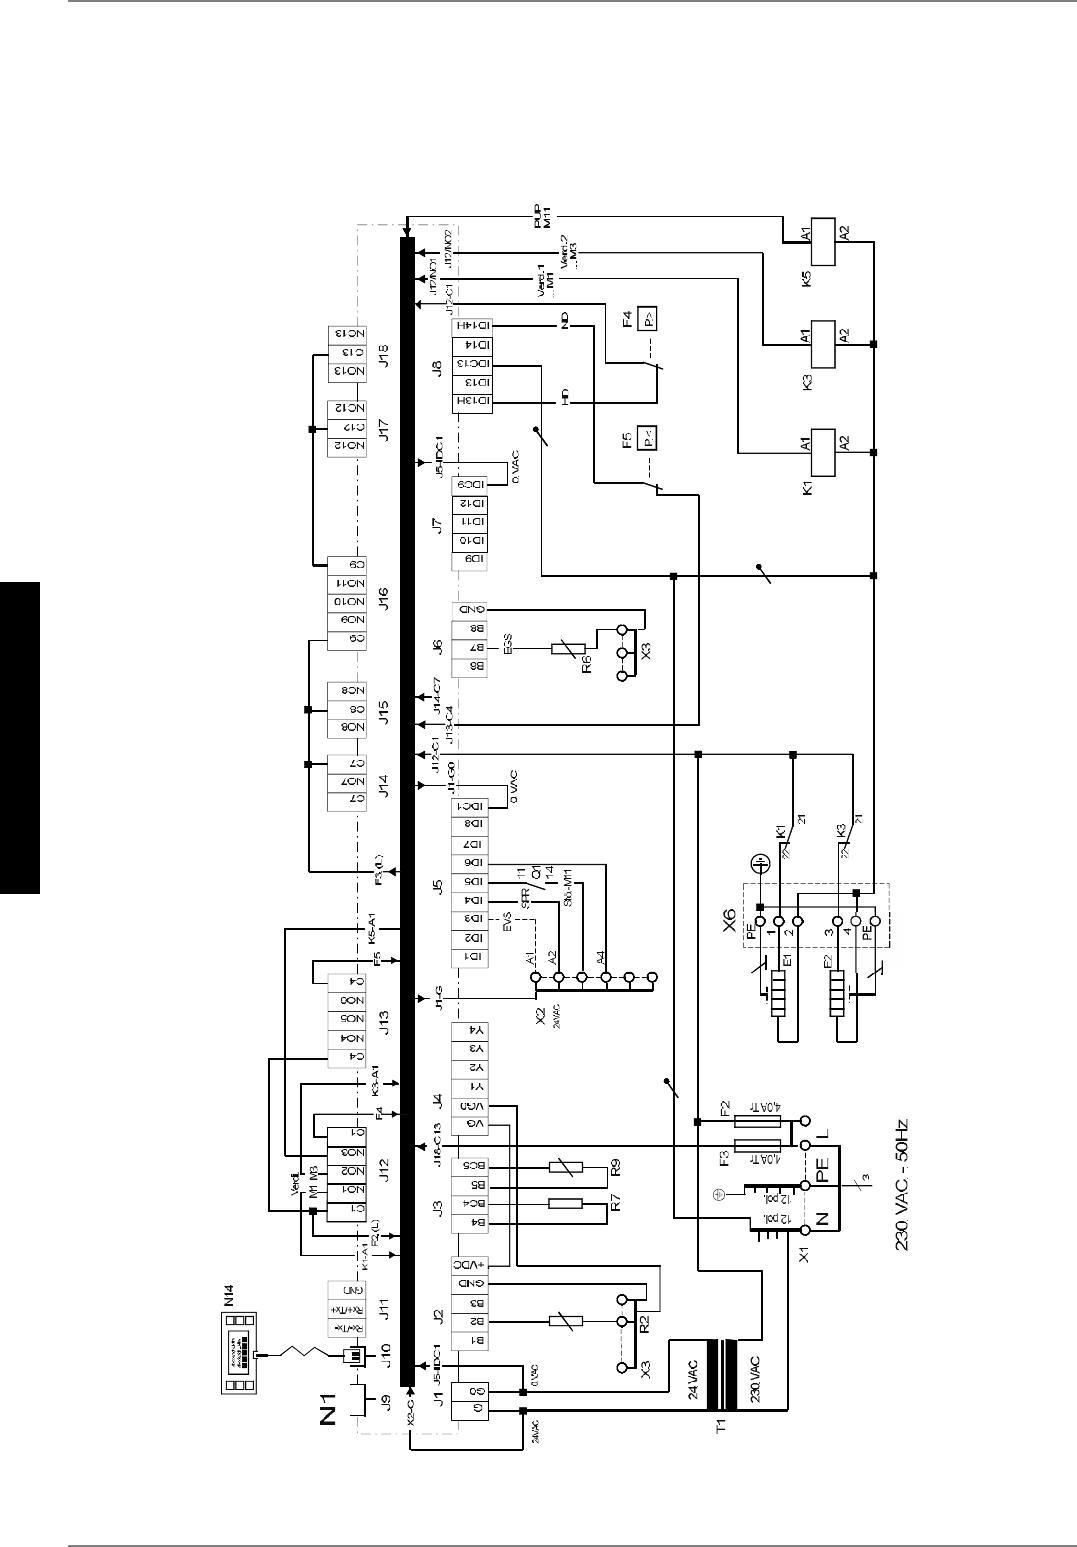 Dimplex Si 24Te 37Te Users Manual Installation